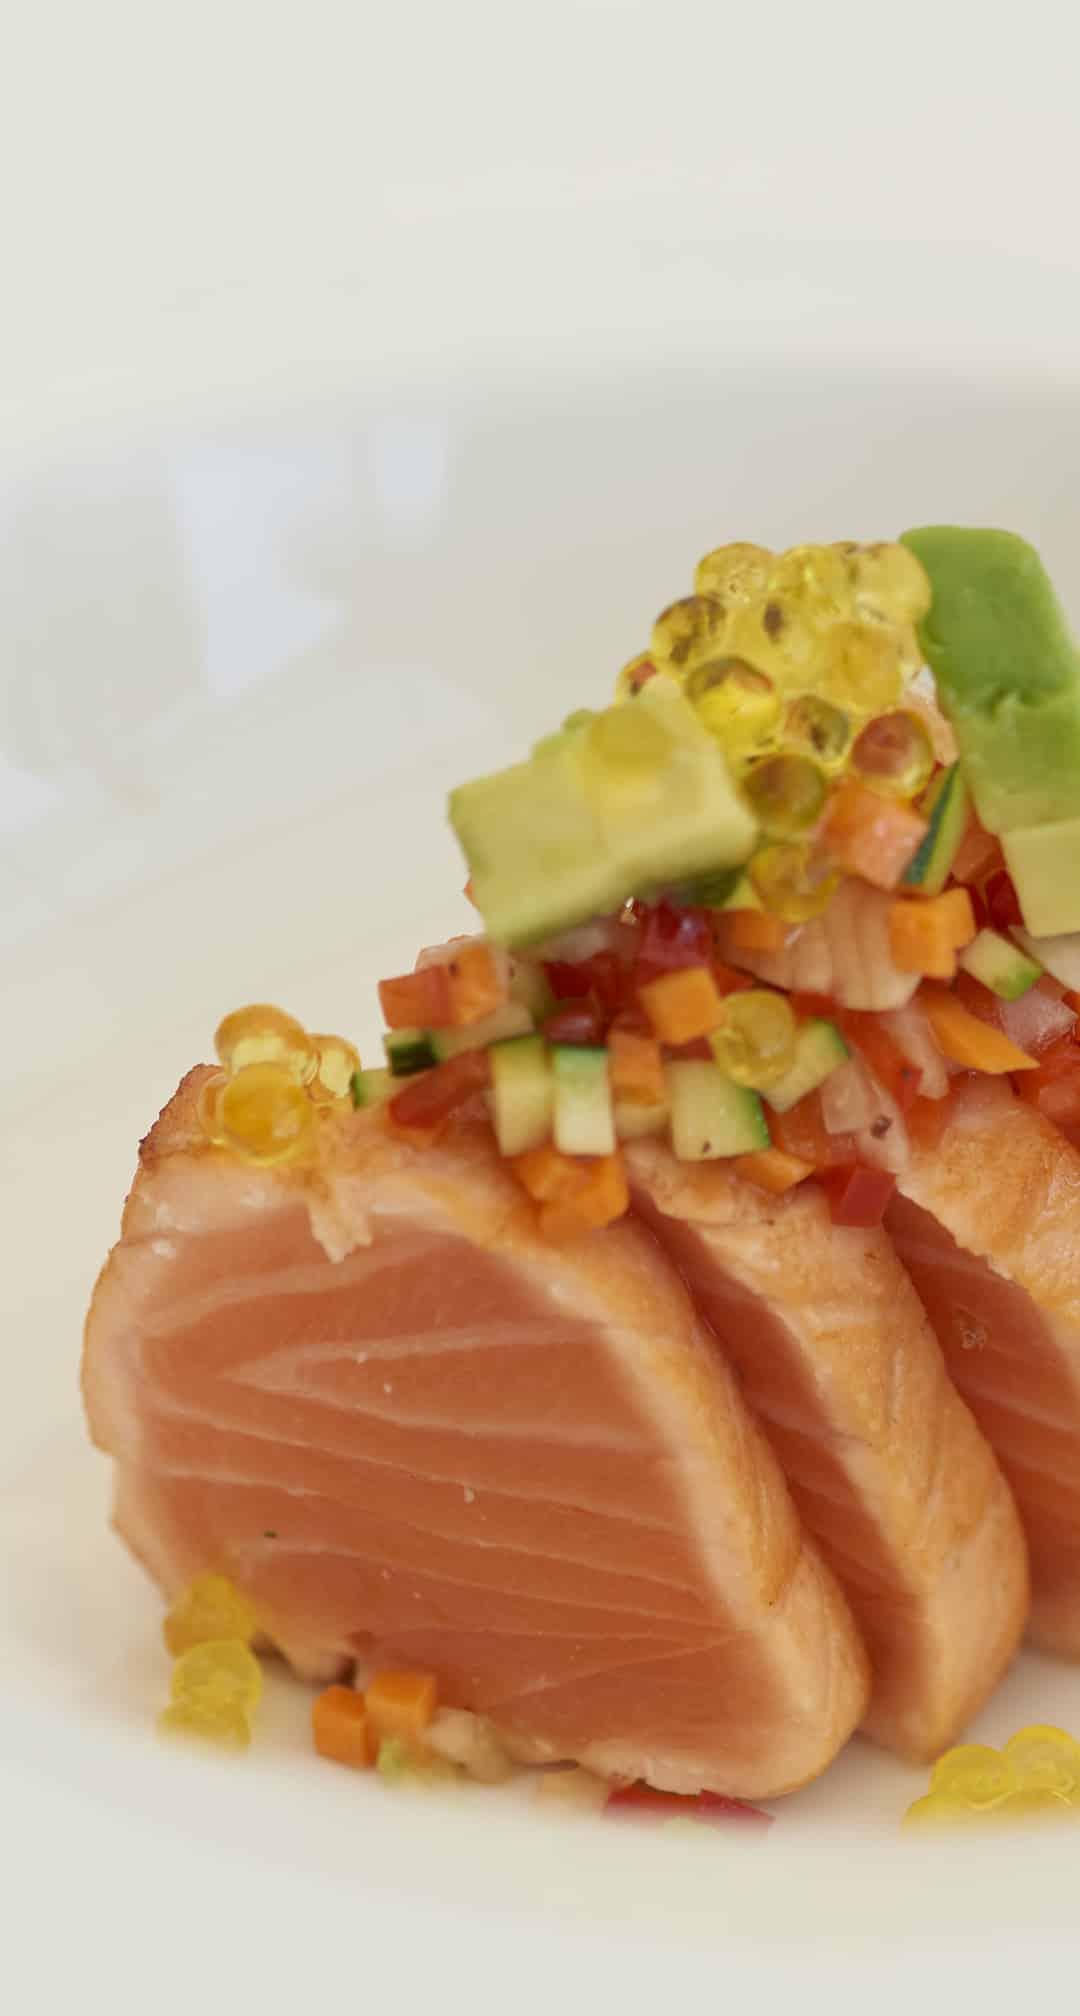 GastronomiaLancaster13